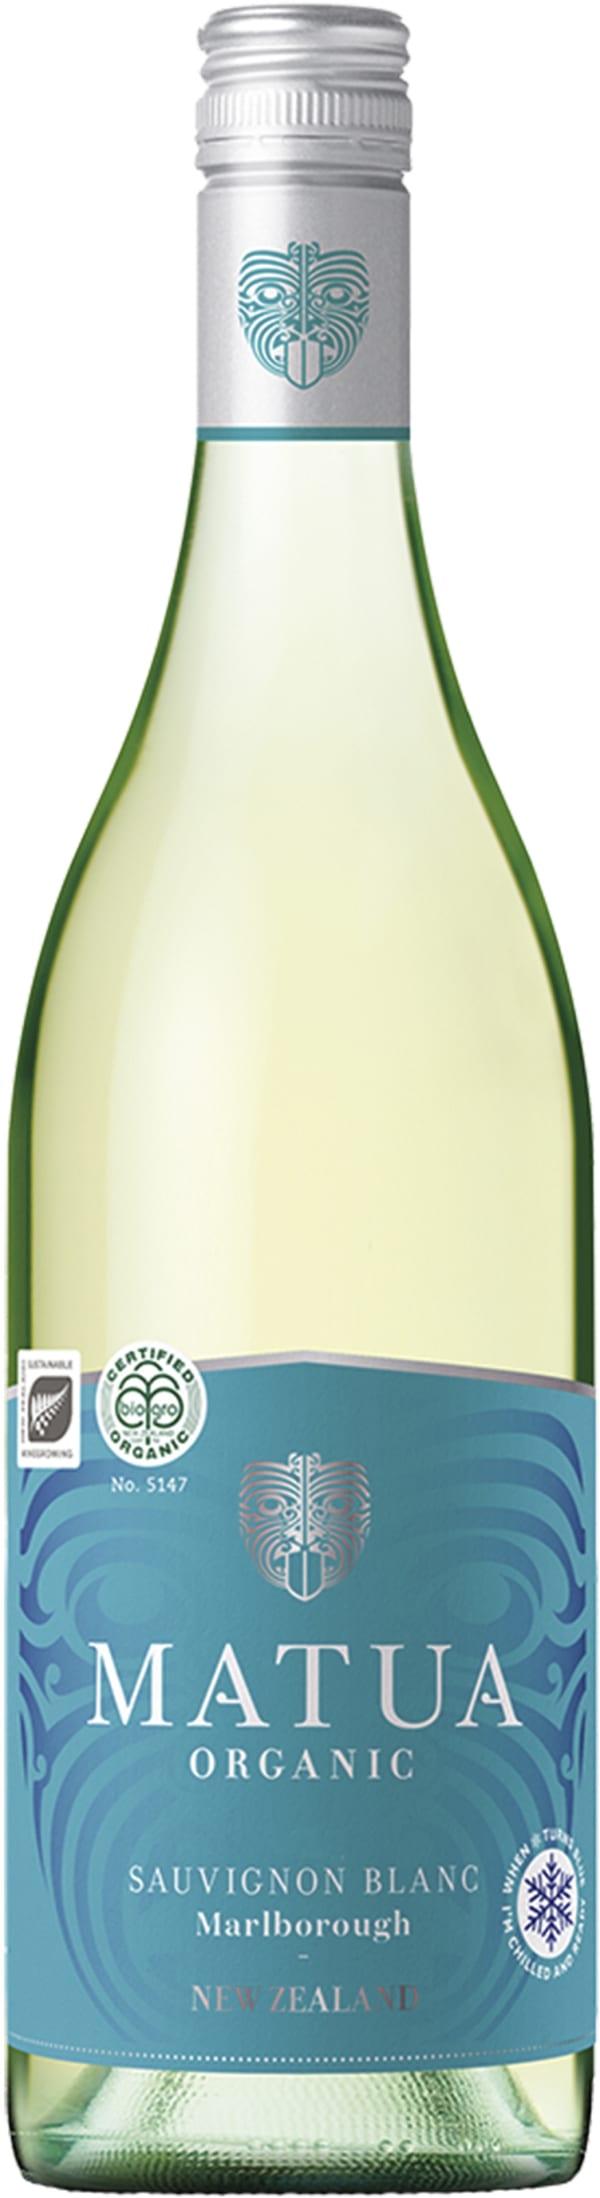 Matua Marlborough Organic Sauvignon Blanc 2019